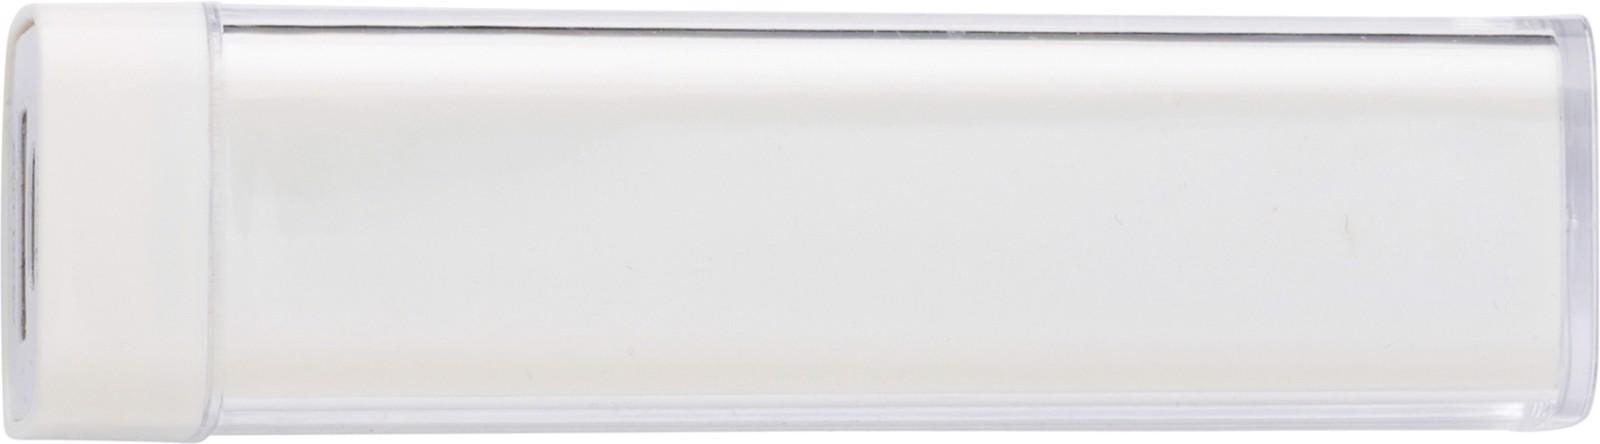 ABS power bank - White